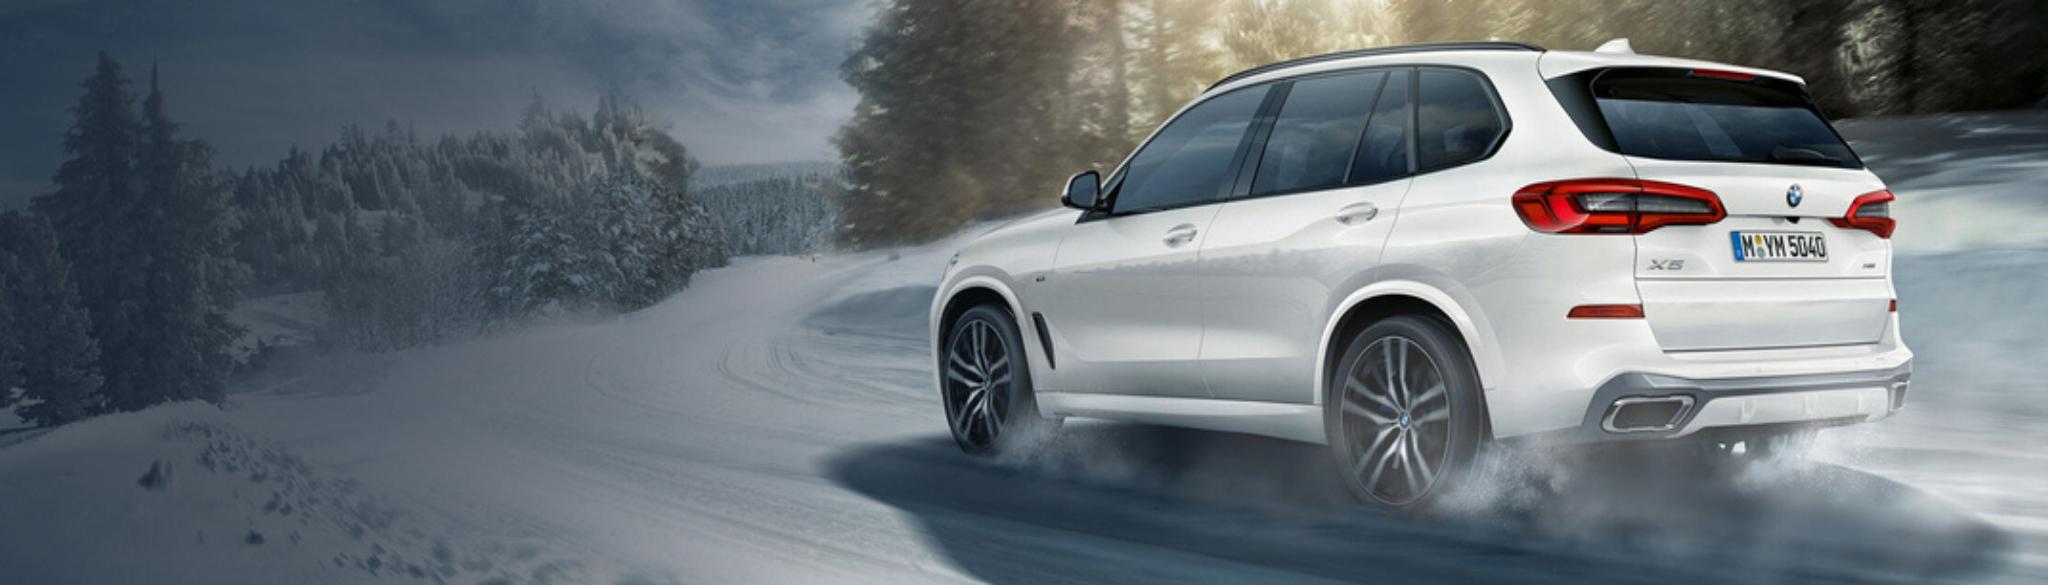 BMW Festive Offers